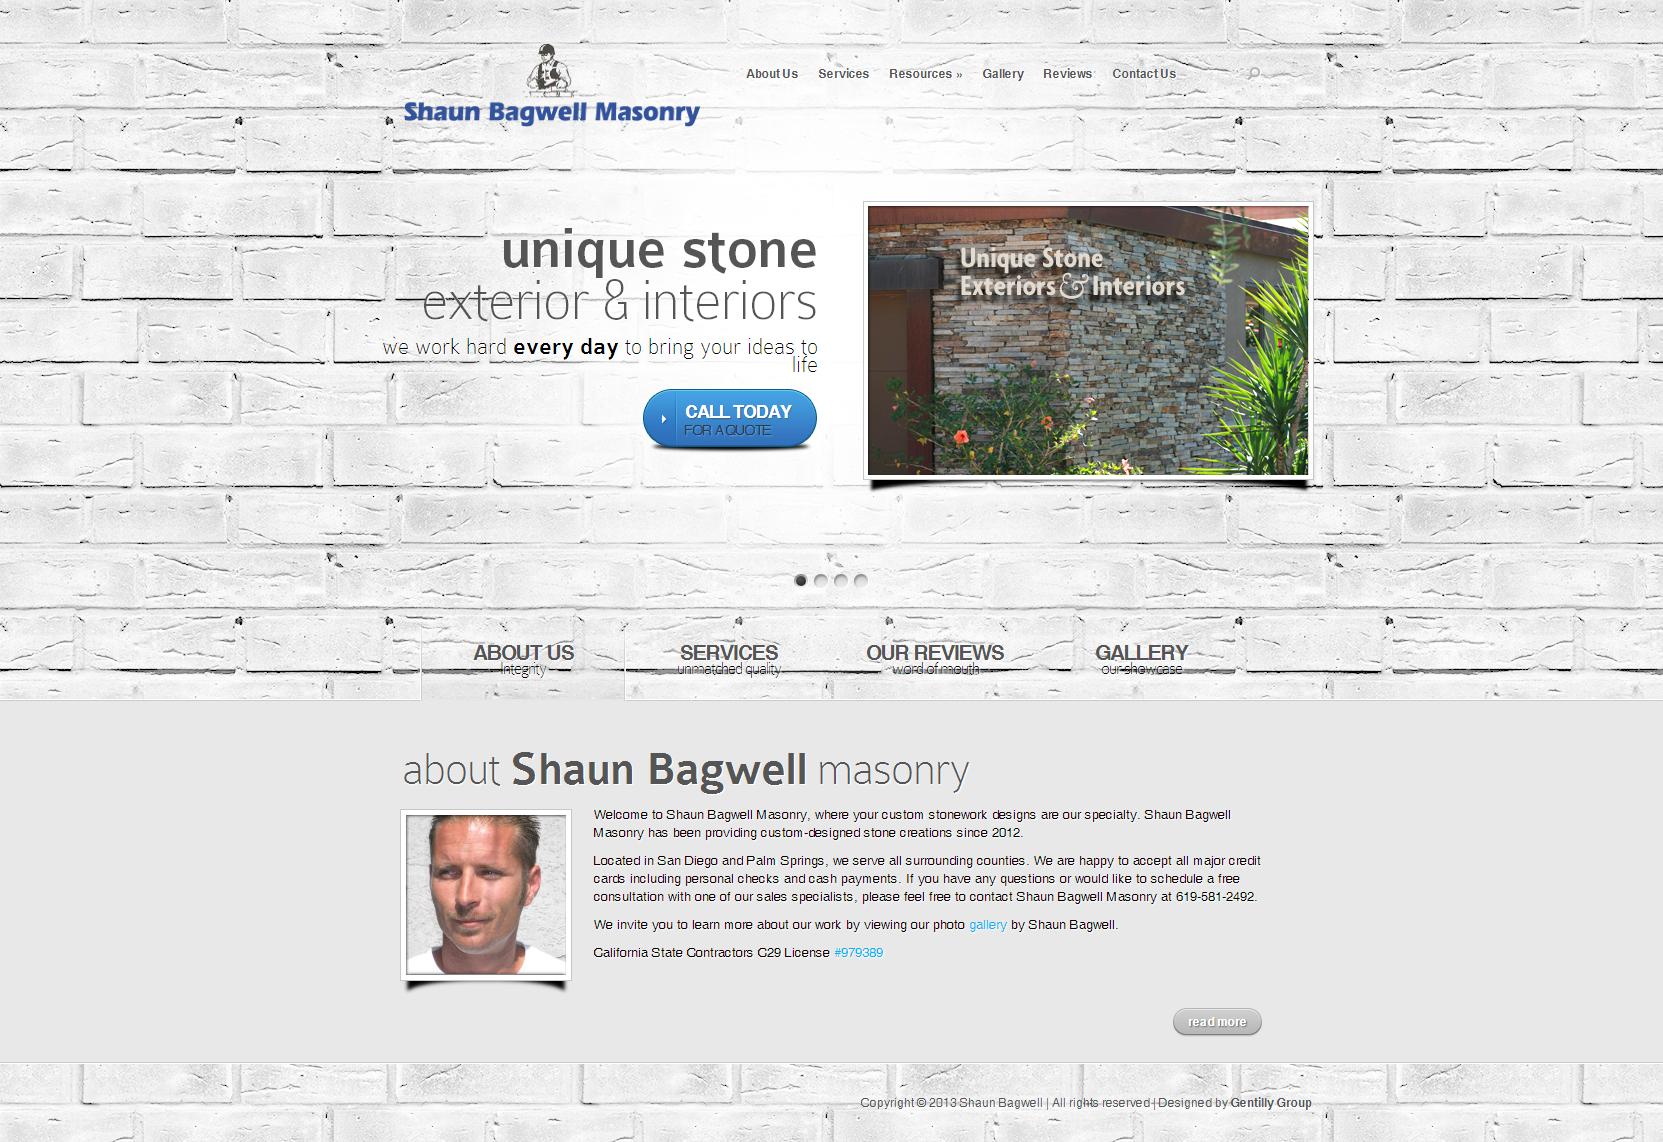 Shaun Bagwell Masonry